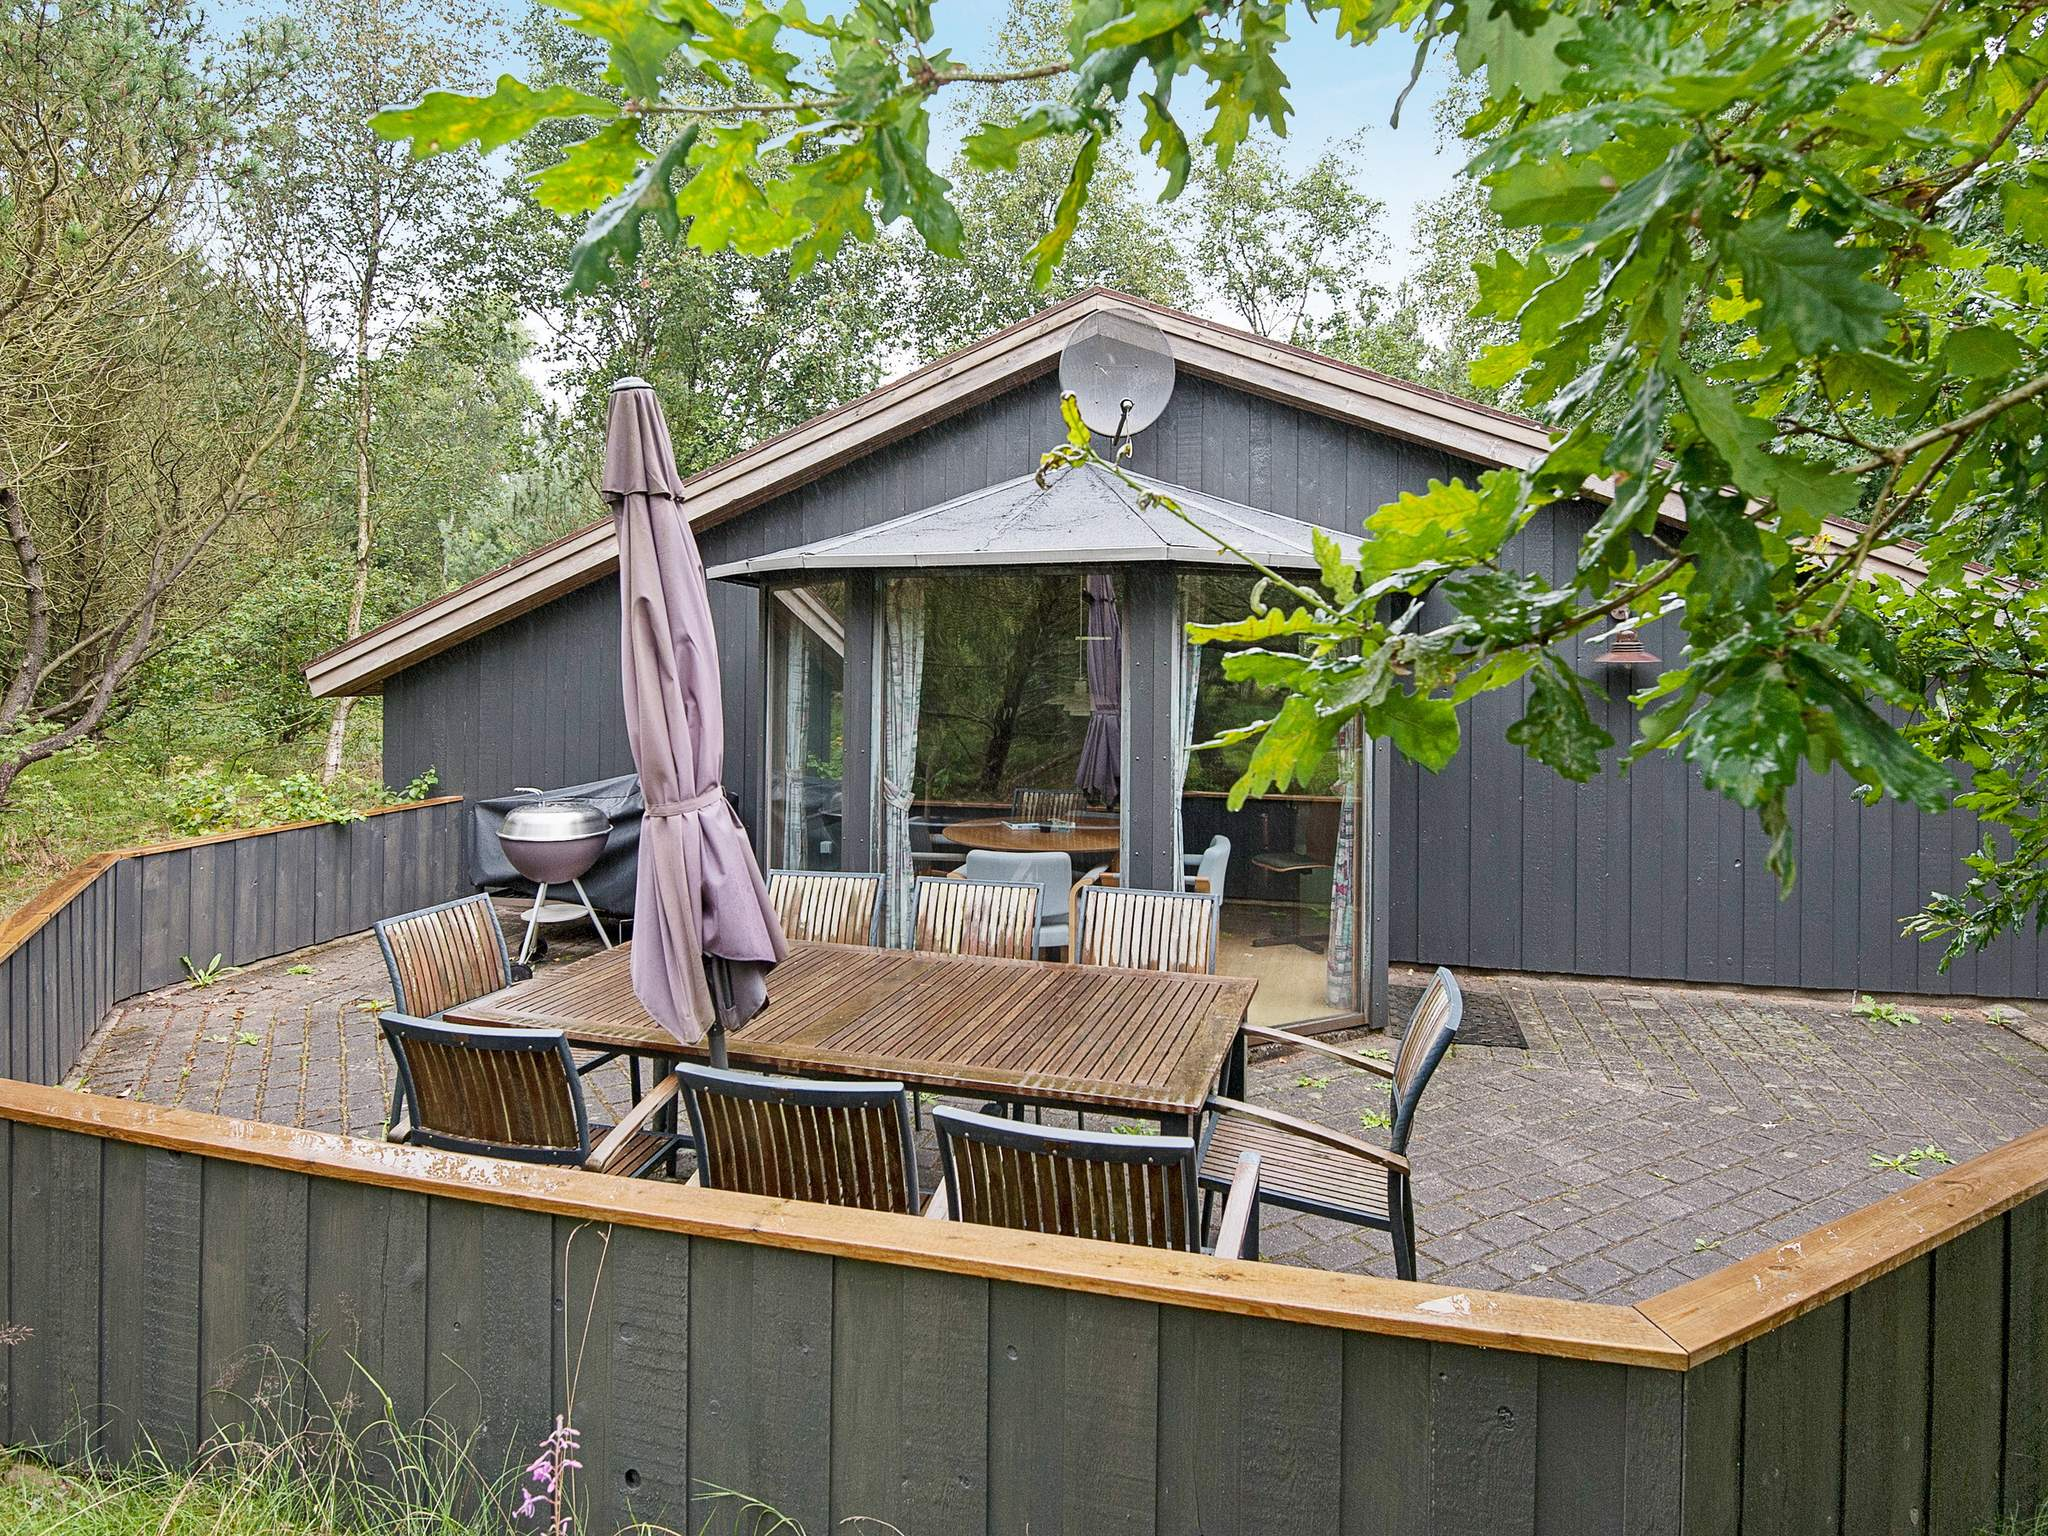 Ferienhaus Kølkær (87697), Kølkær, , Westjütland, Dänemark, Bild 22